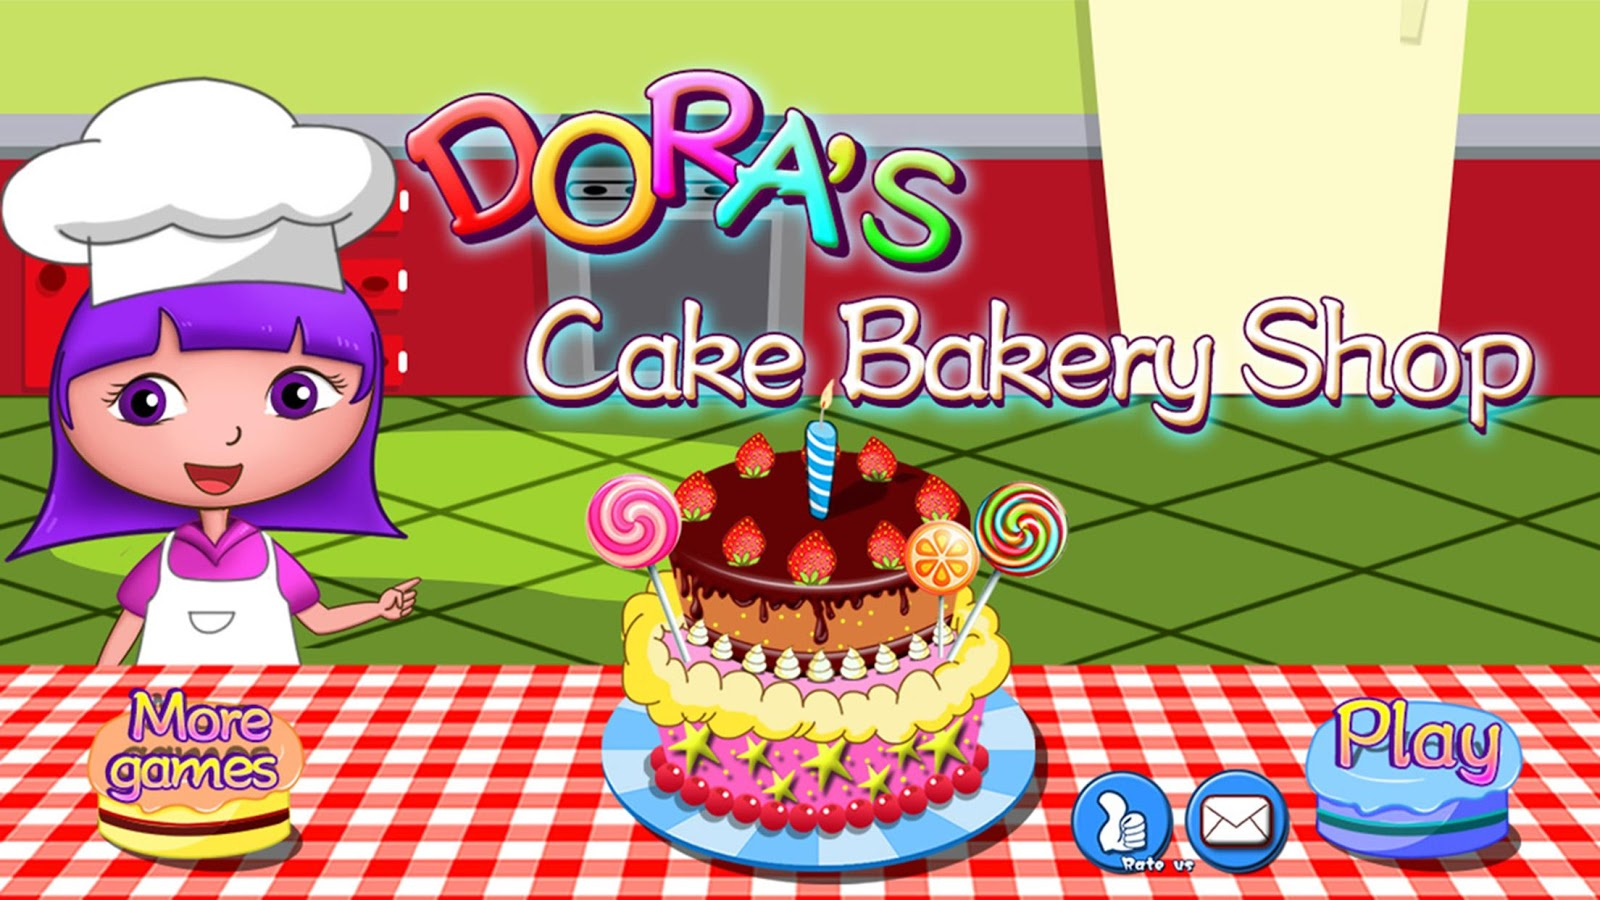 Dora birthday cake bakery shop 1.1 APK Download - Android ...